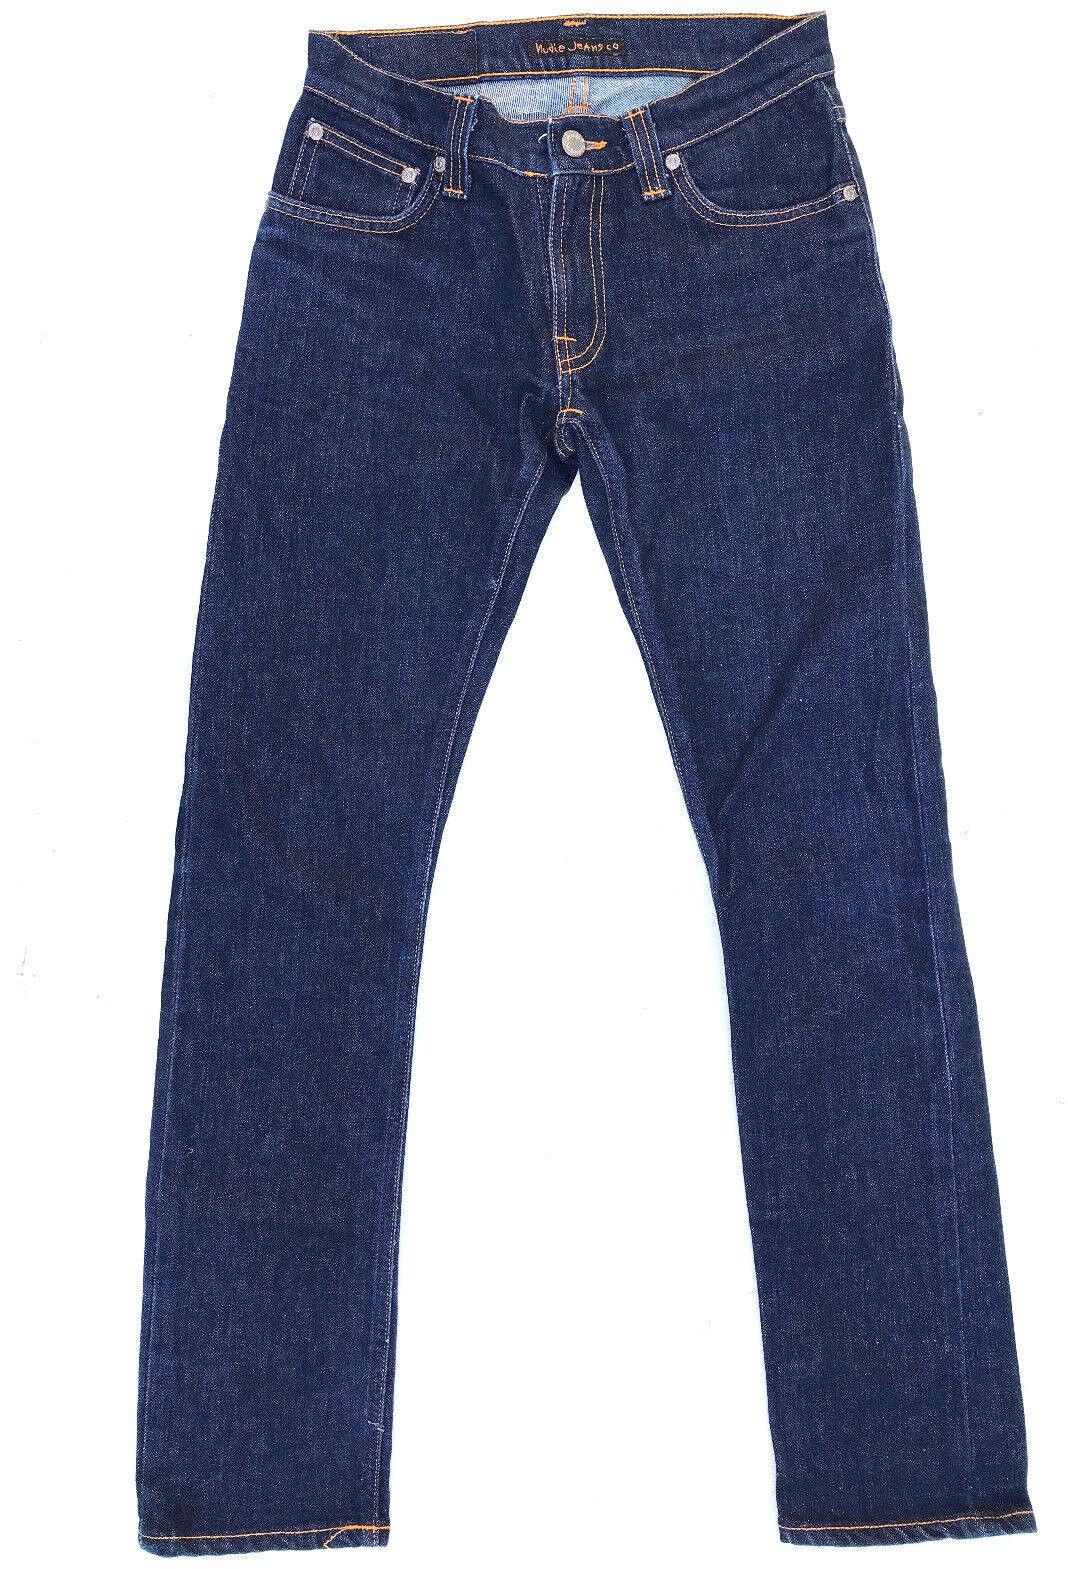 Nudie Jeans 'SUPER SLIM KIM' Dry Stretch bluee Jeans W28 L32 EUC RRP  Womens